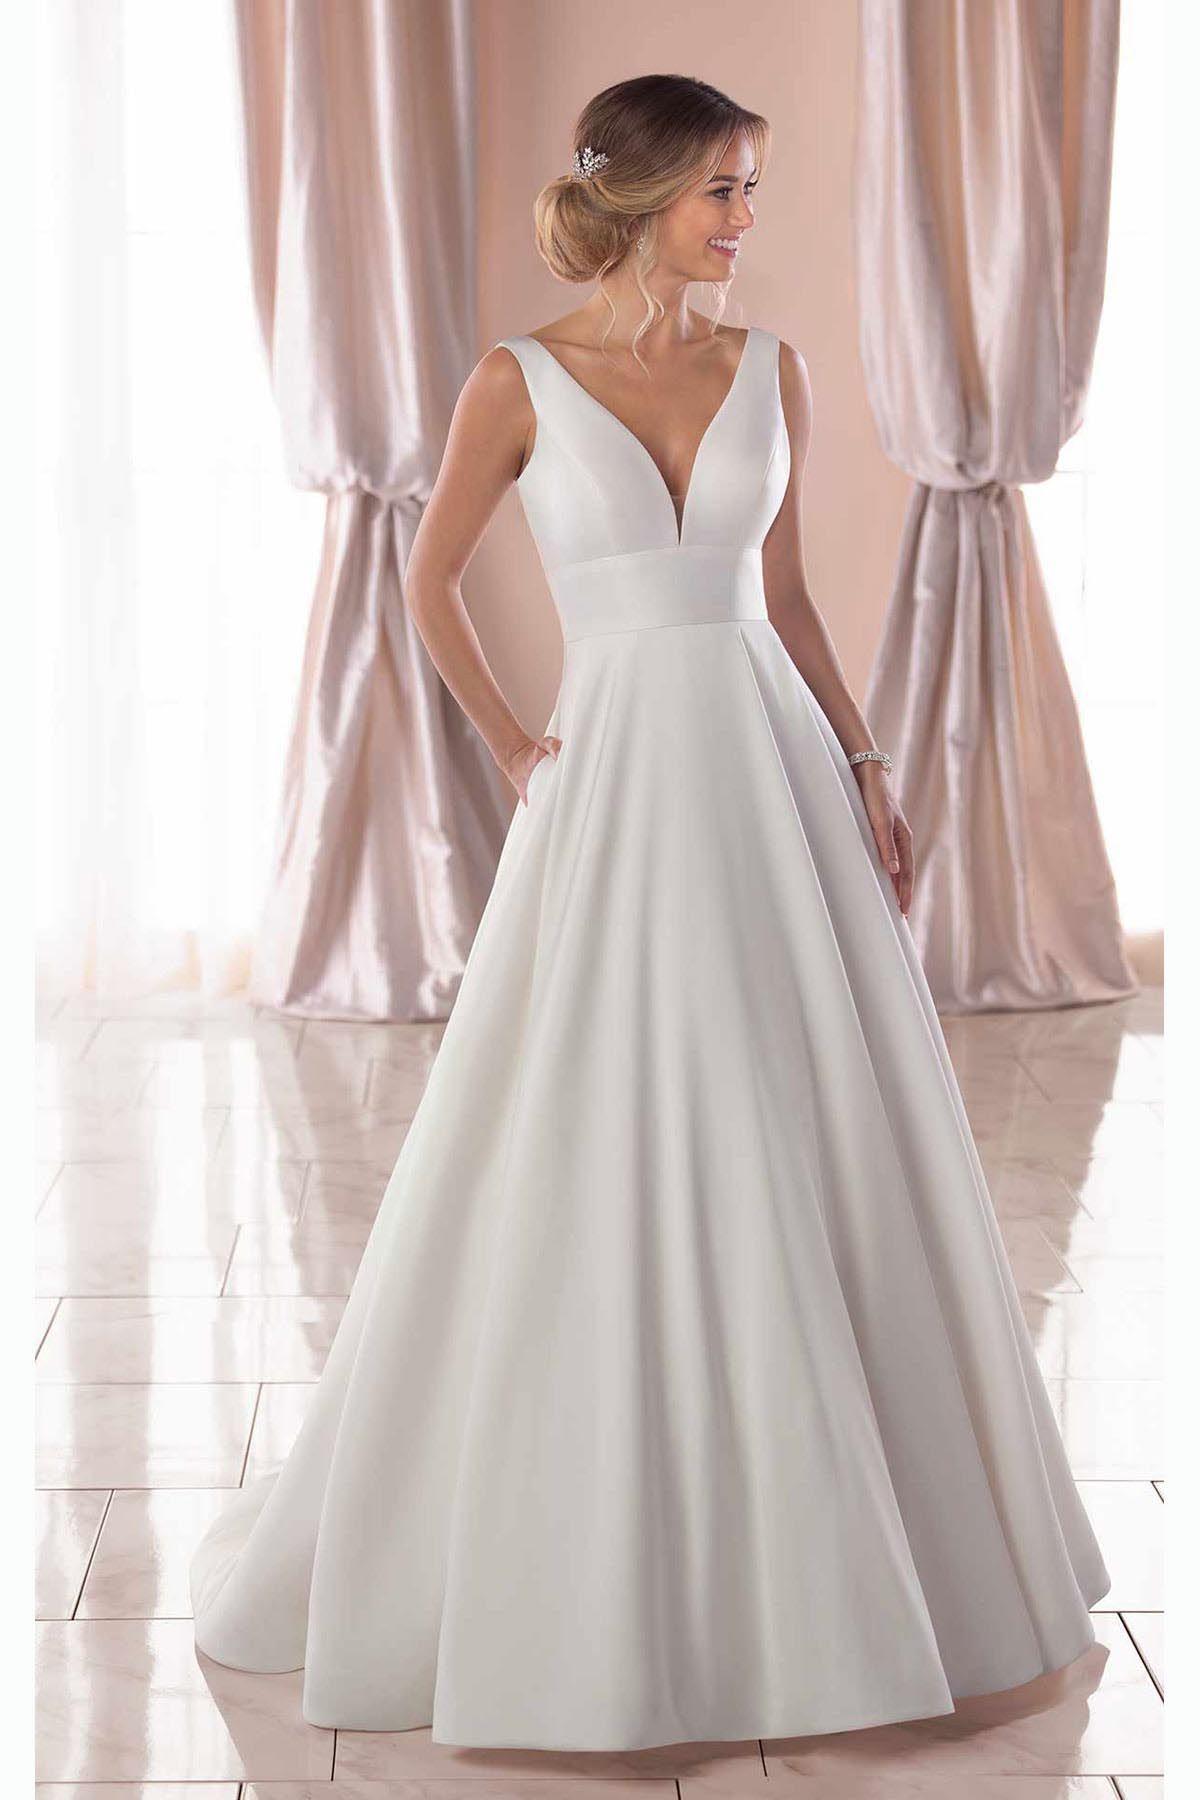 Bliss Bridal Salon Bridal Gowns Wedding Dresses Fort Worth Dallas Ball Gown Wedding Dress Stella York Wedding Dress Wedding Dresses Lace [ 1800 x 1200 Pixel ]